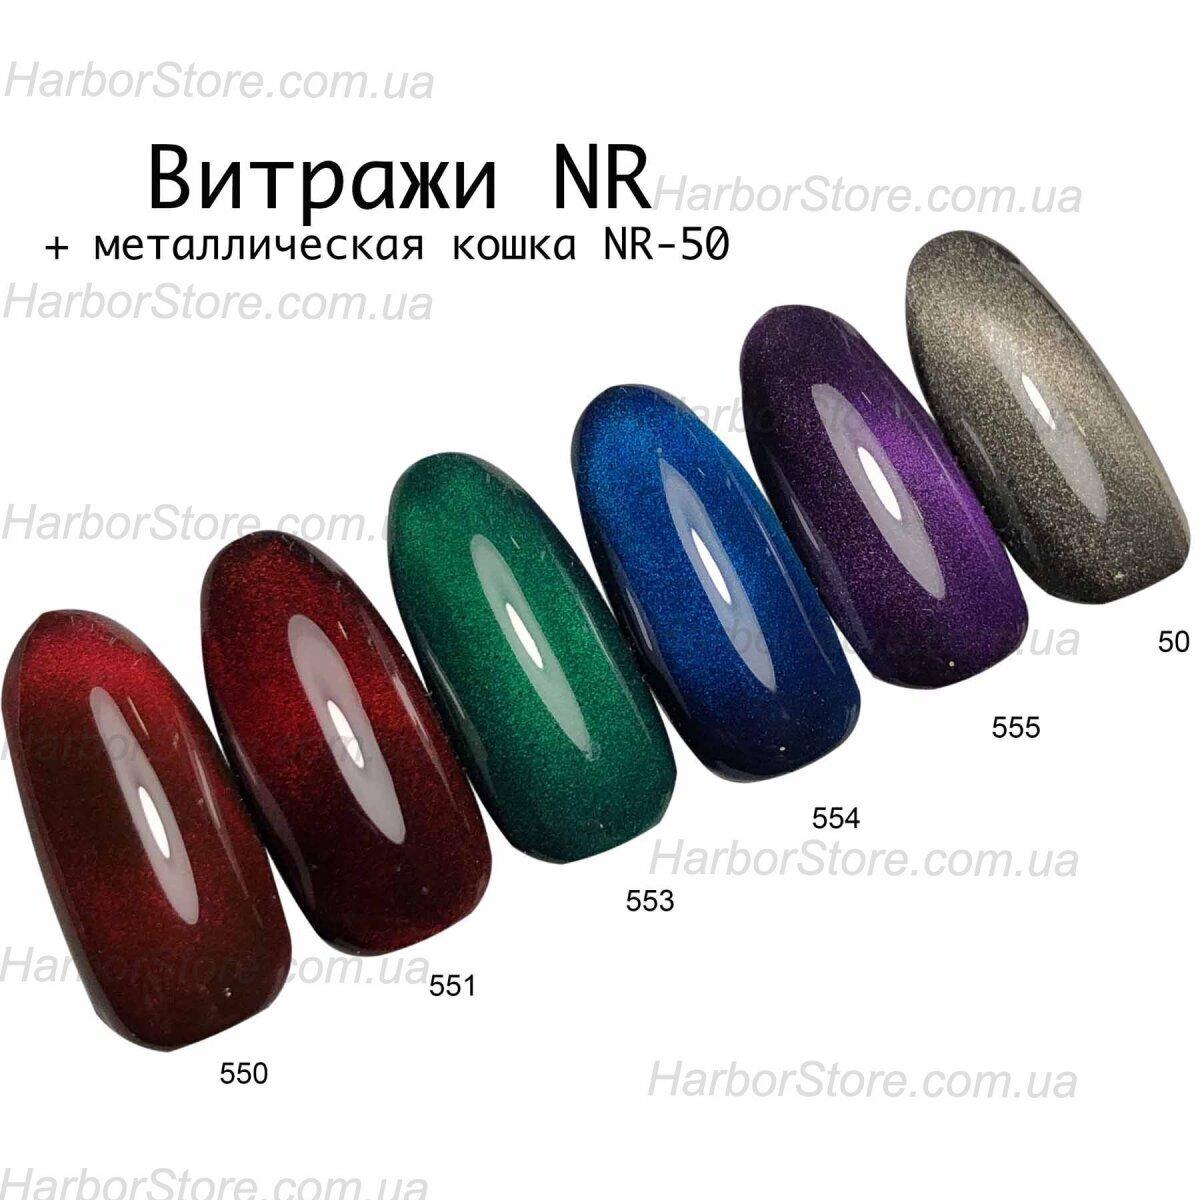 NR 551